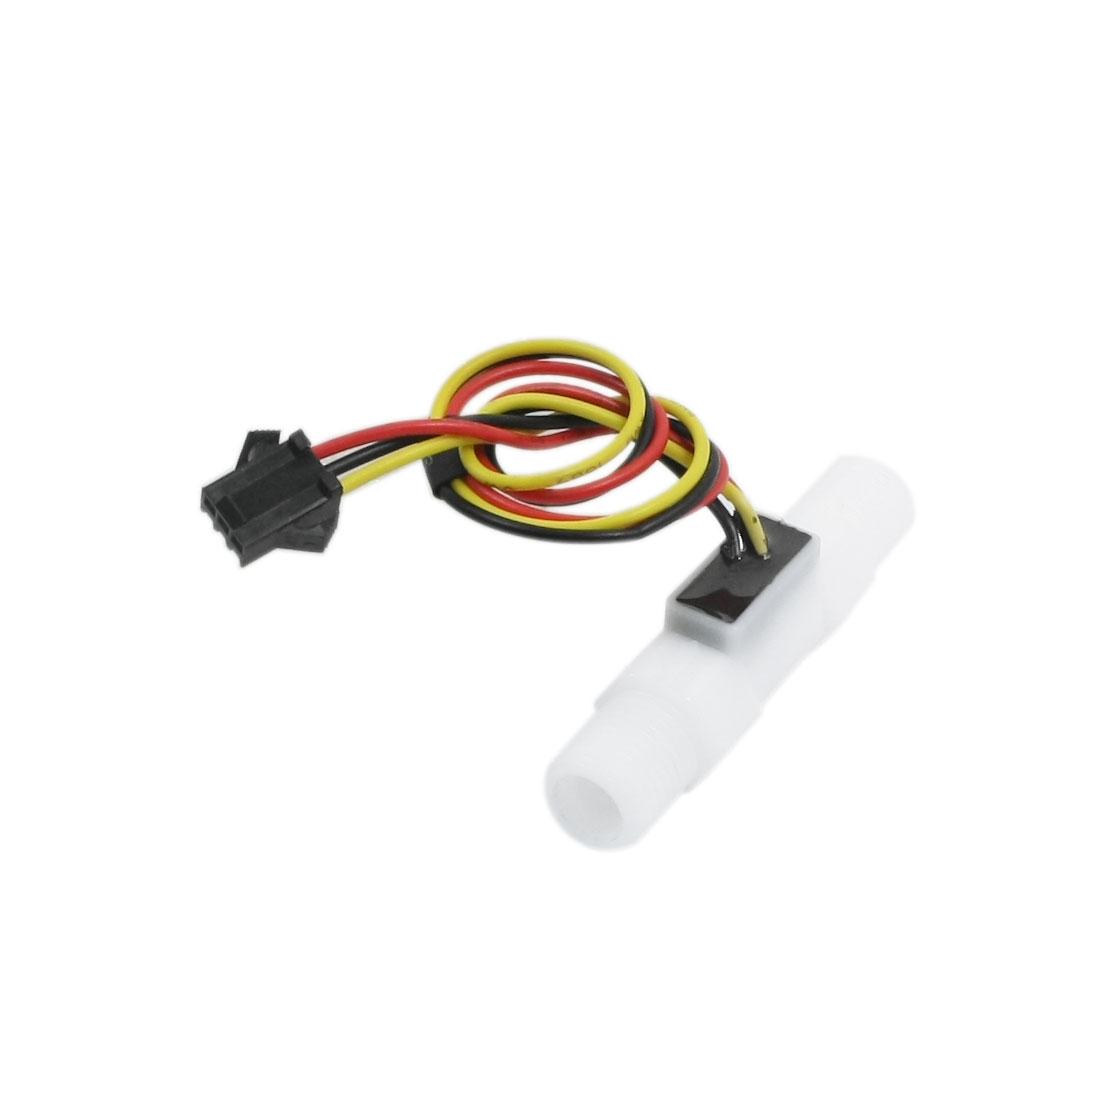 SEN-HZ41W 3.5L/min G1/4 Male Thread Hall Effect Water Flow Sensor Switch Flowmeter